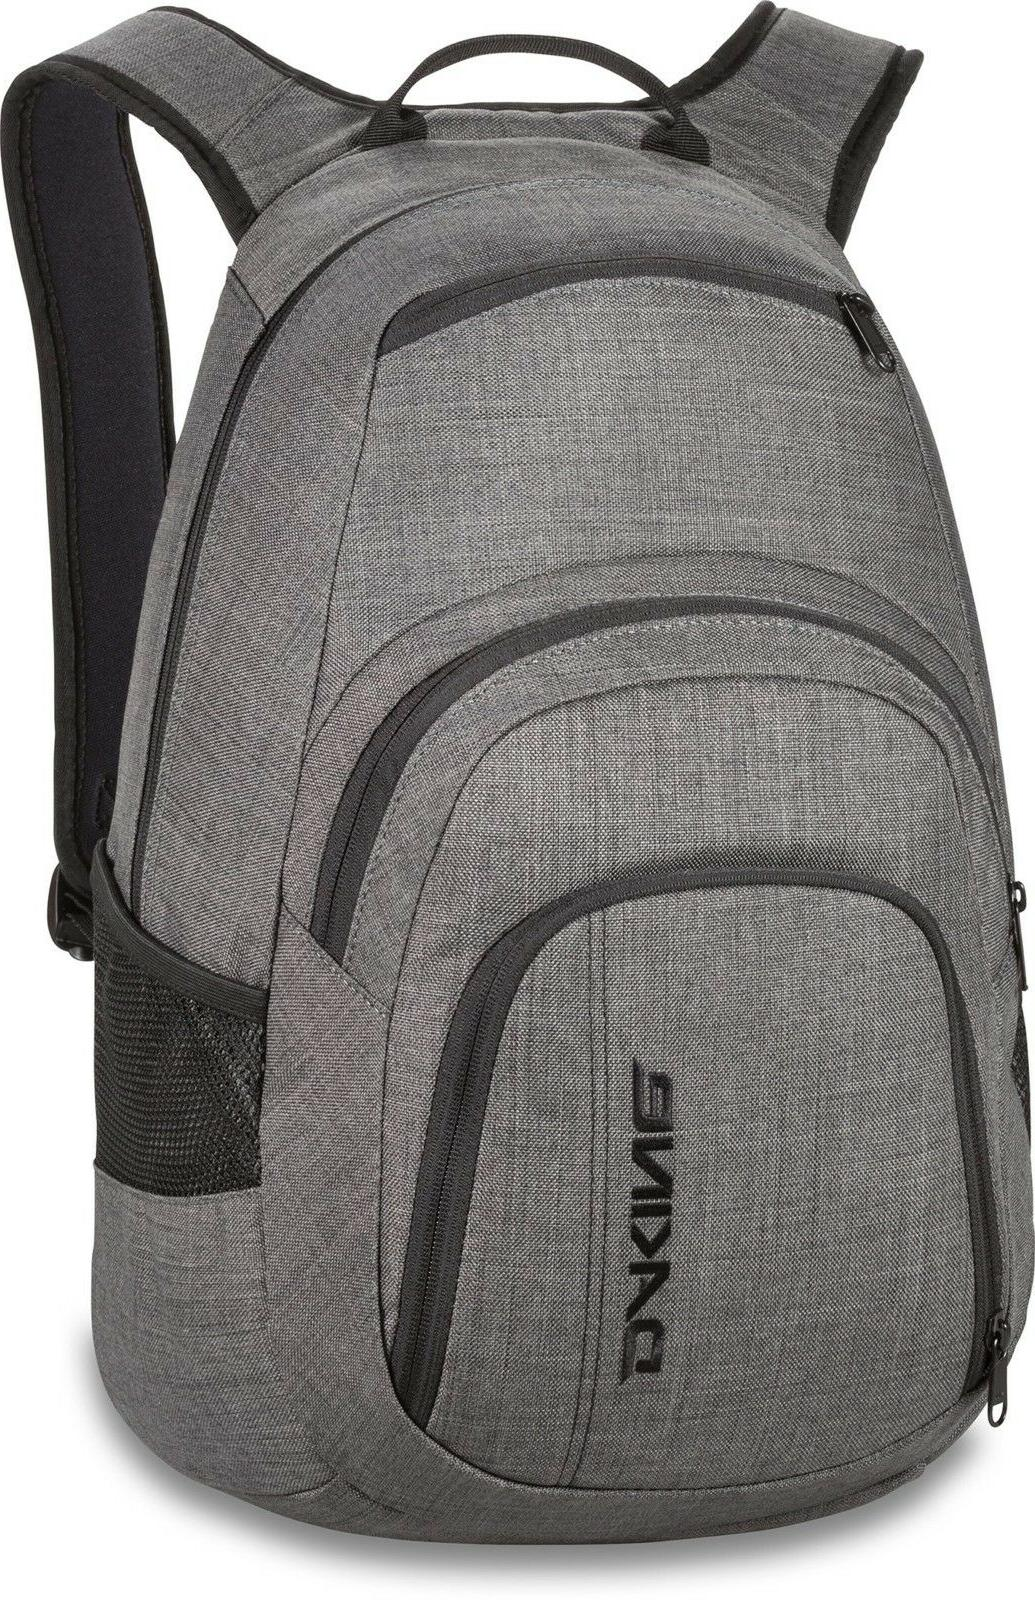 Dakine Campus Backpack, Carbon, 25L Genuine Dakine ®